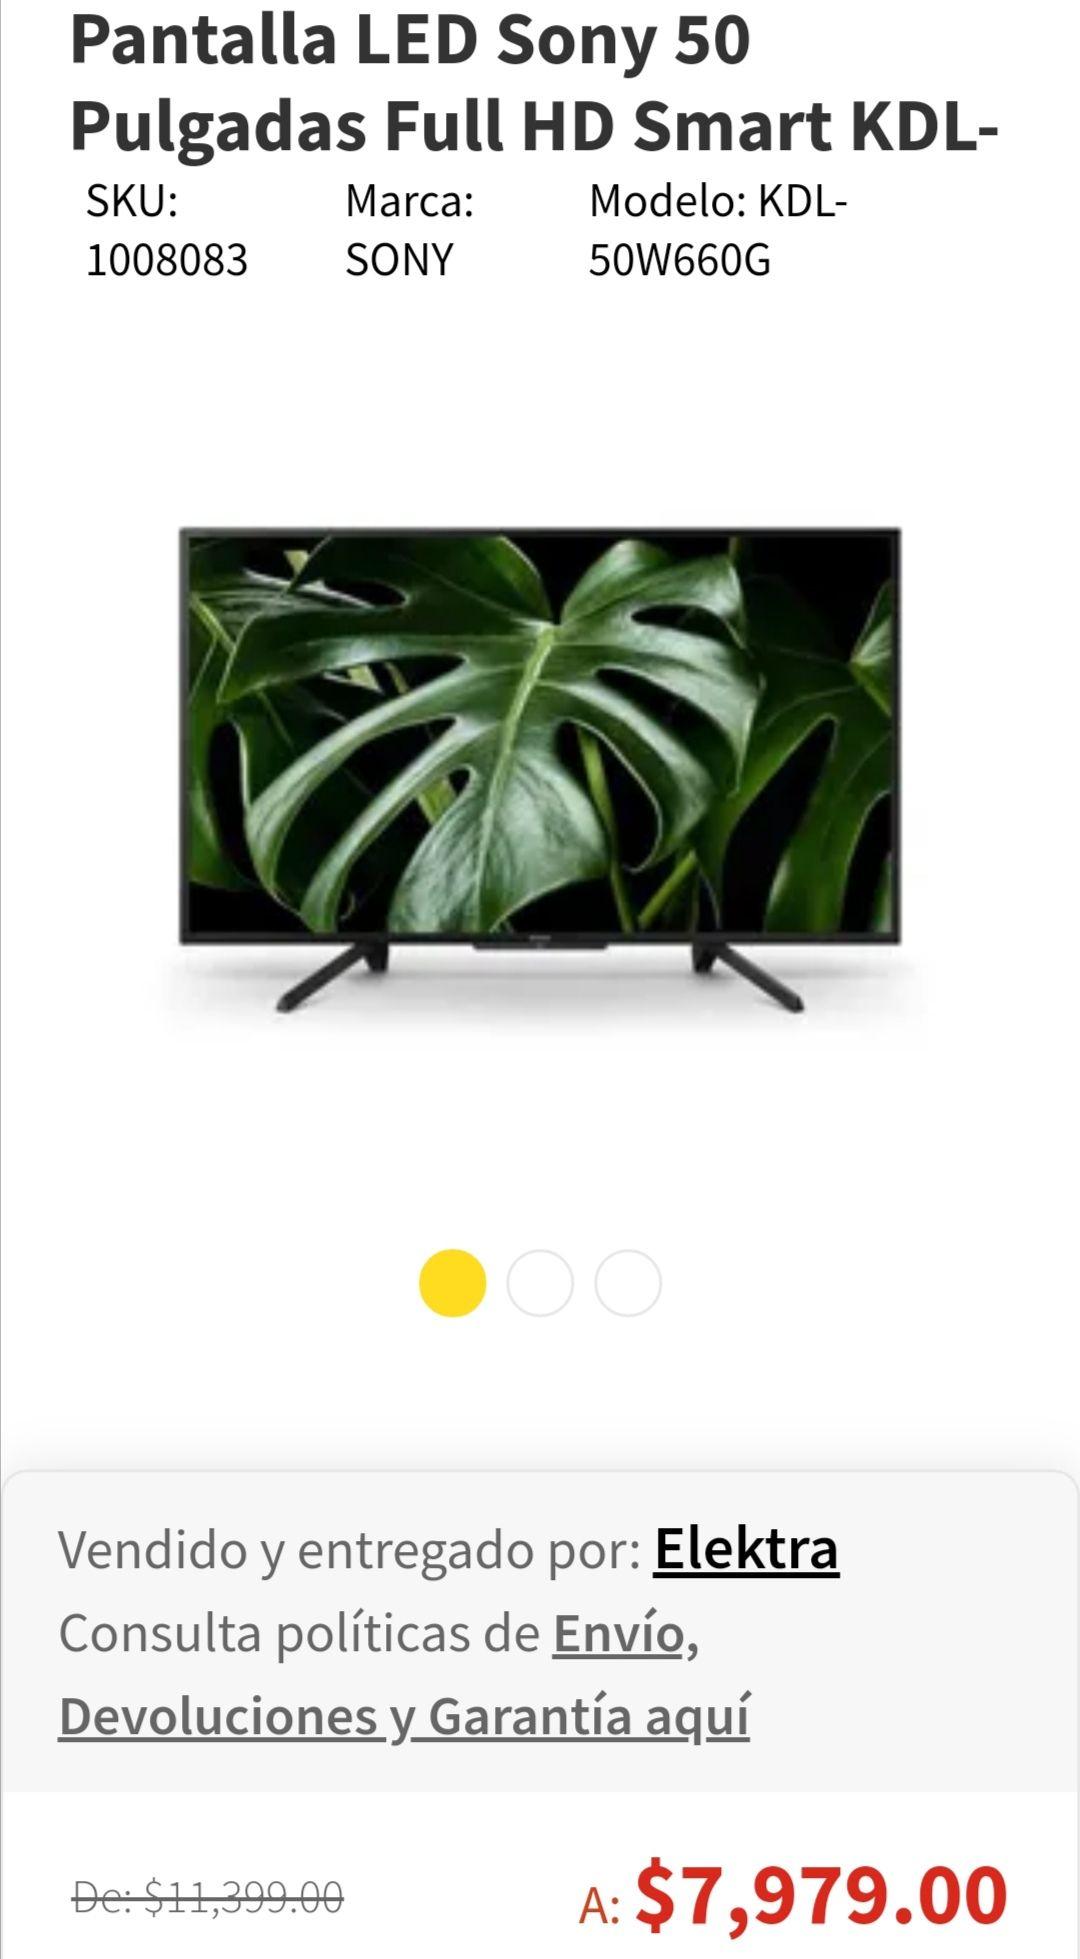 Elektra en línea: Pantalla LED Sony 50 Pulgadas Full HD Smart KDL-50W660G